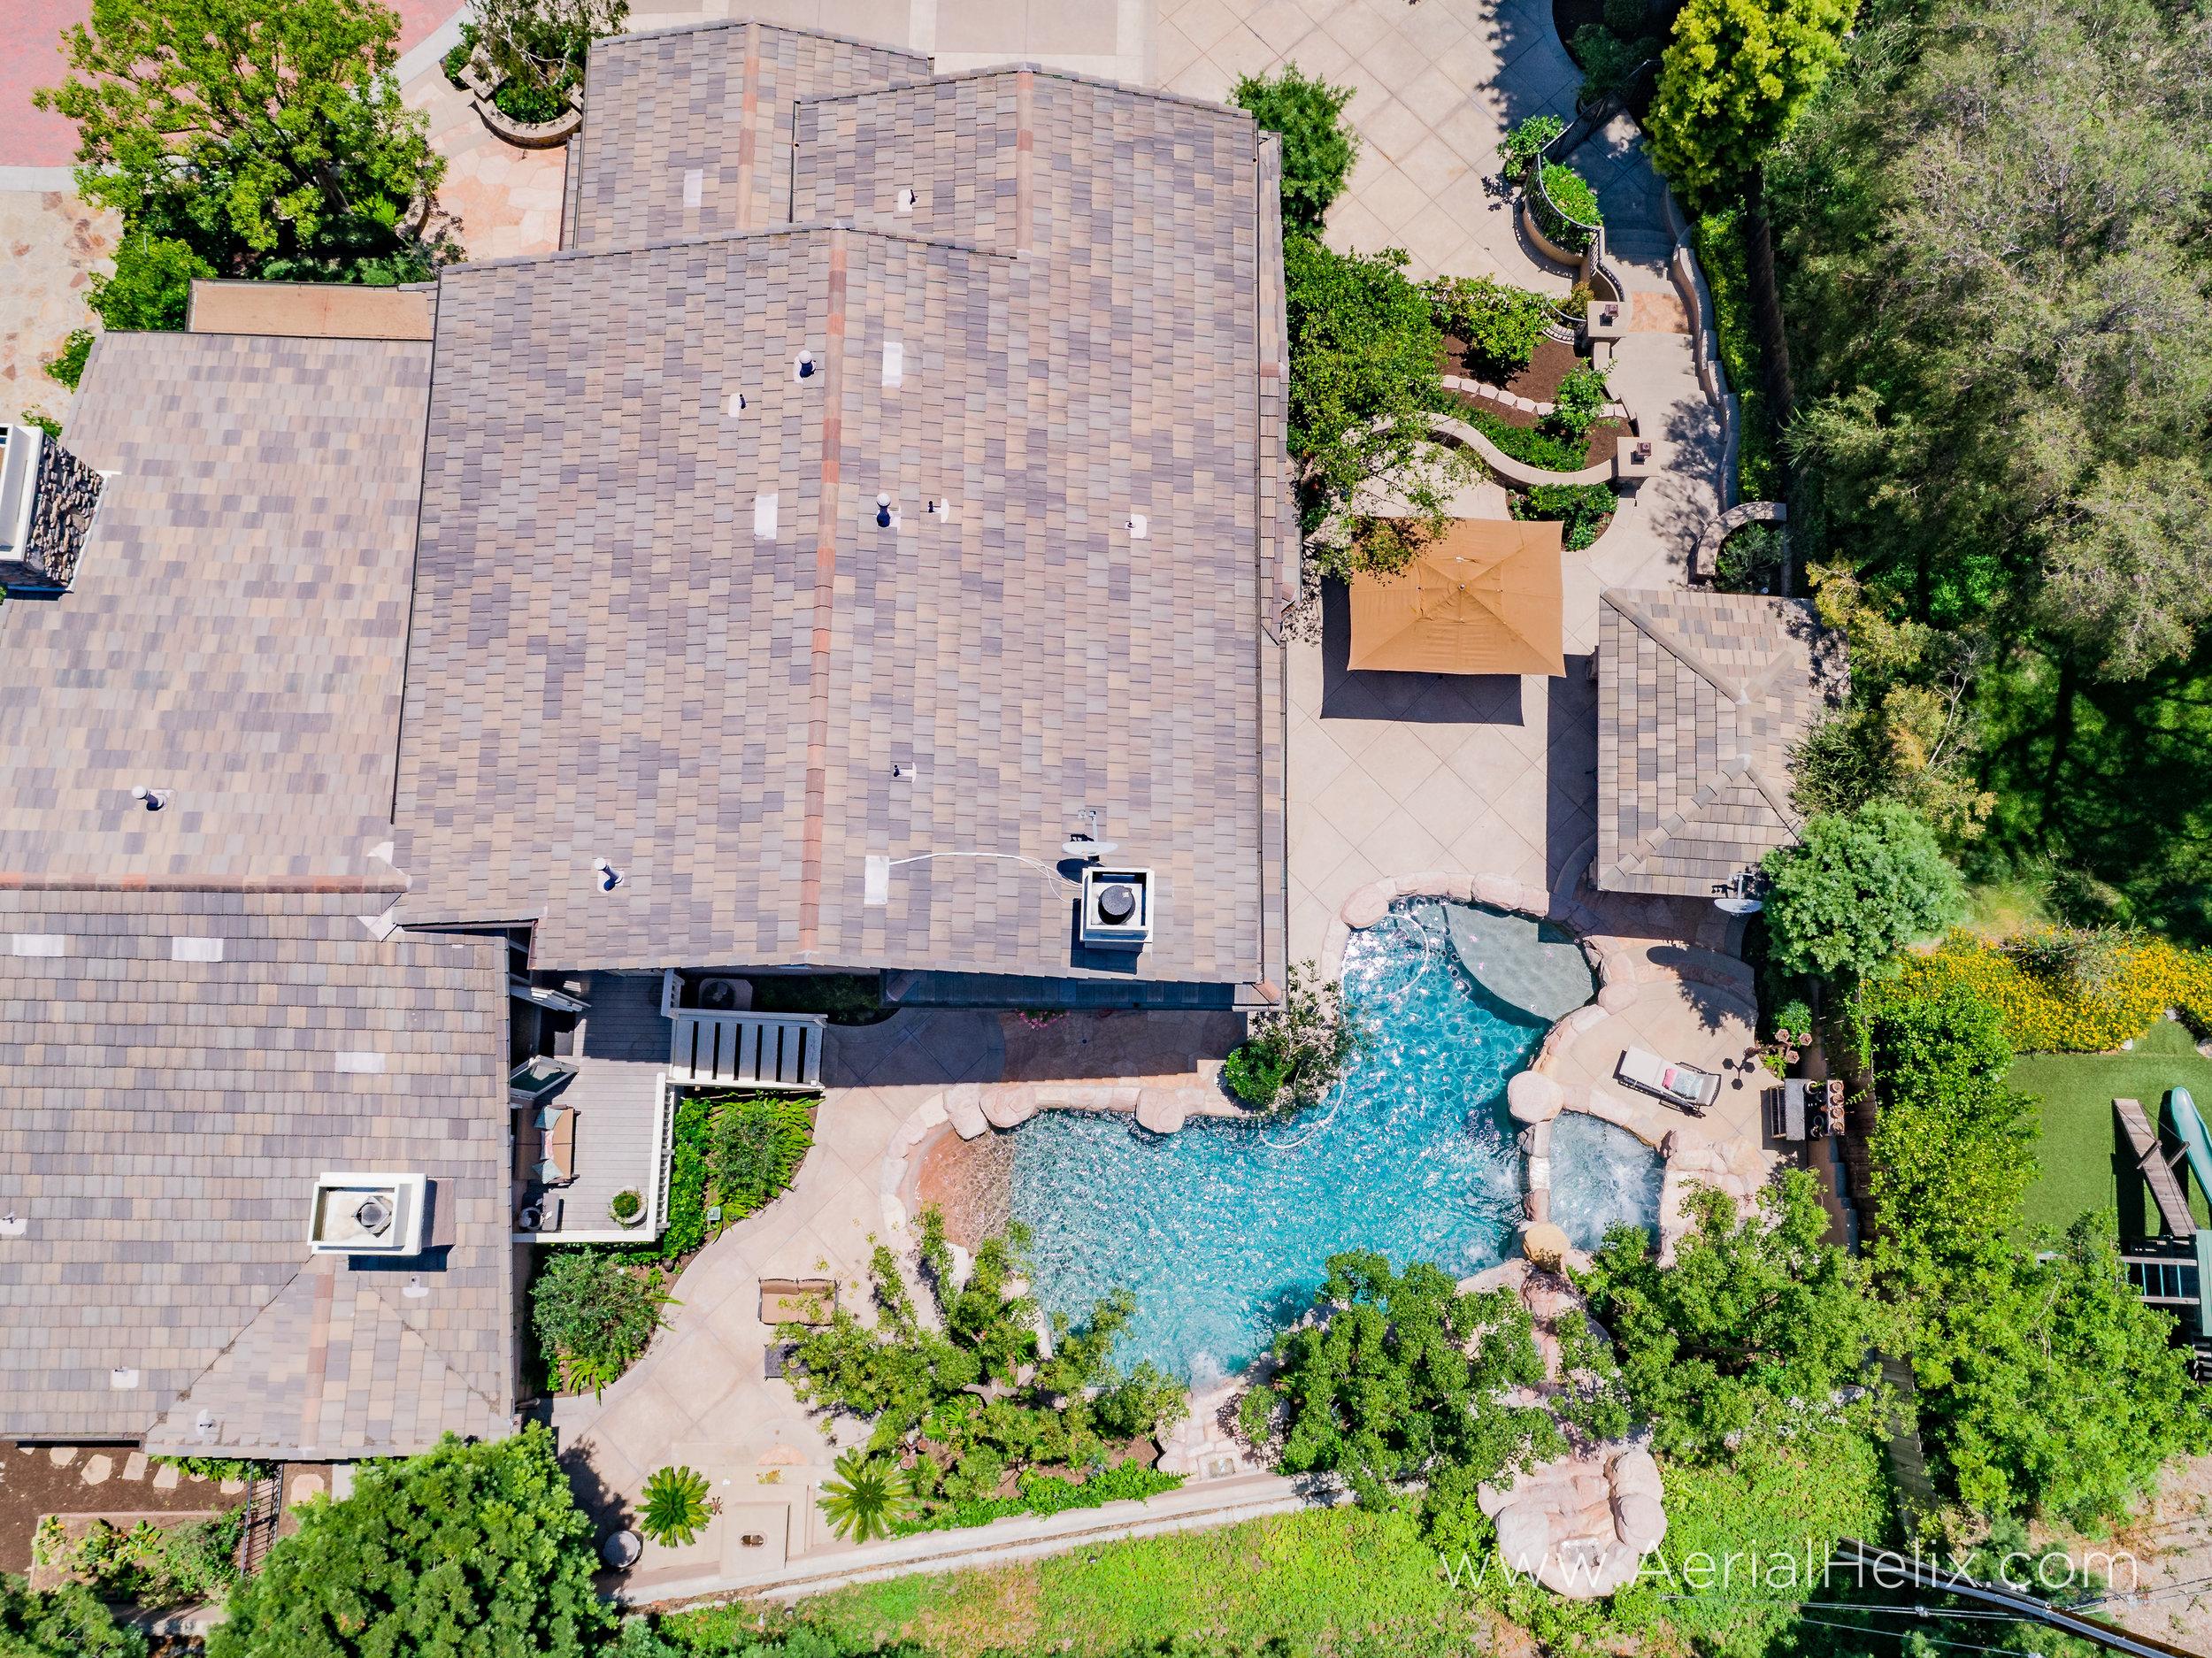 HELIX - Craftsman Lane - Real Estate Drone Photographer-14.jpg